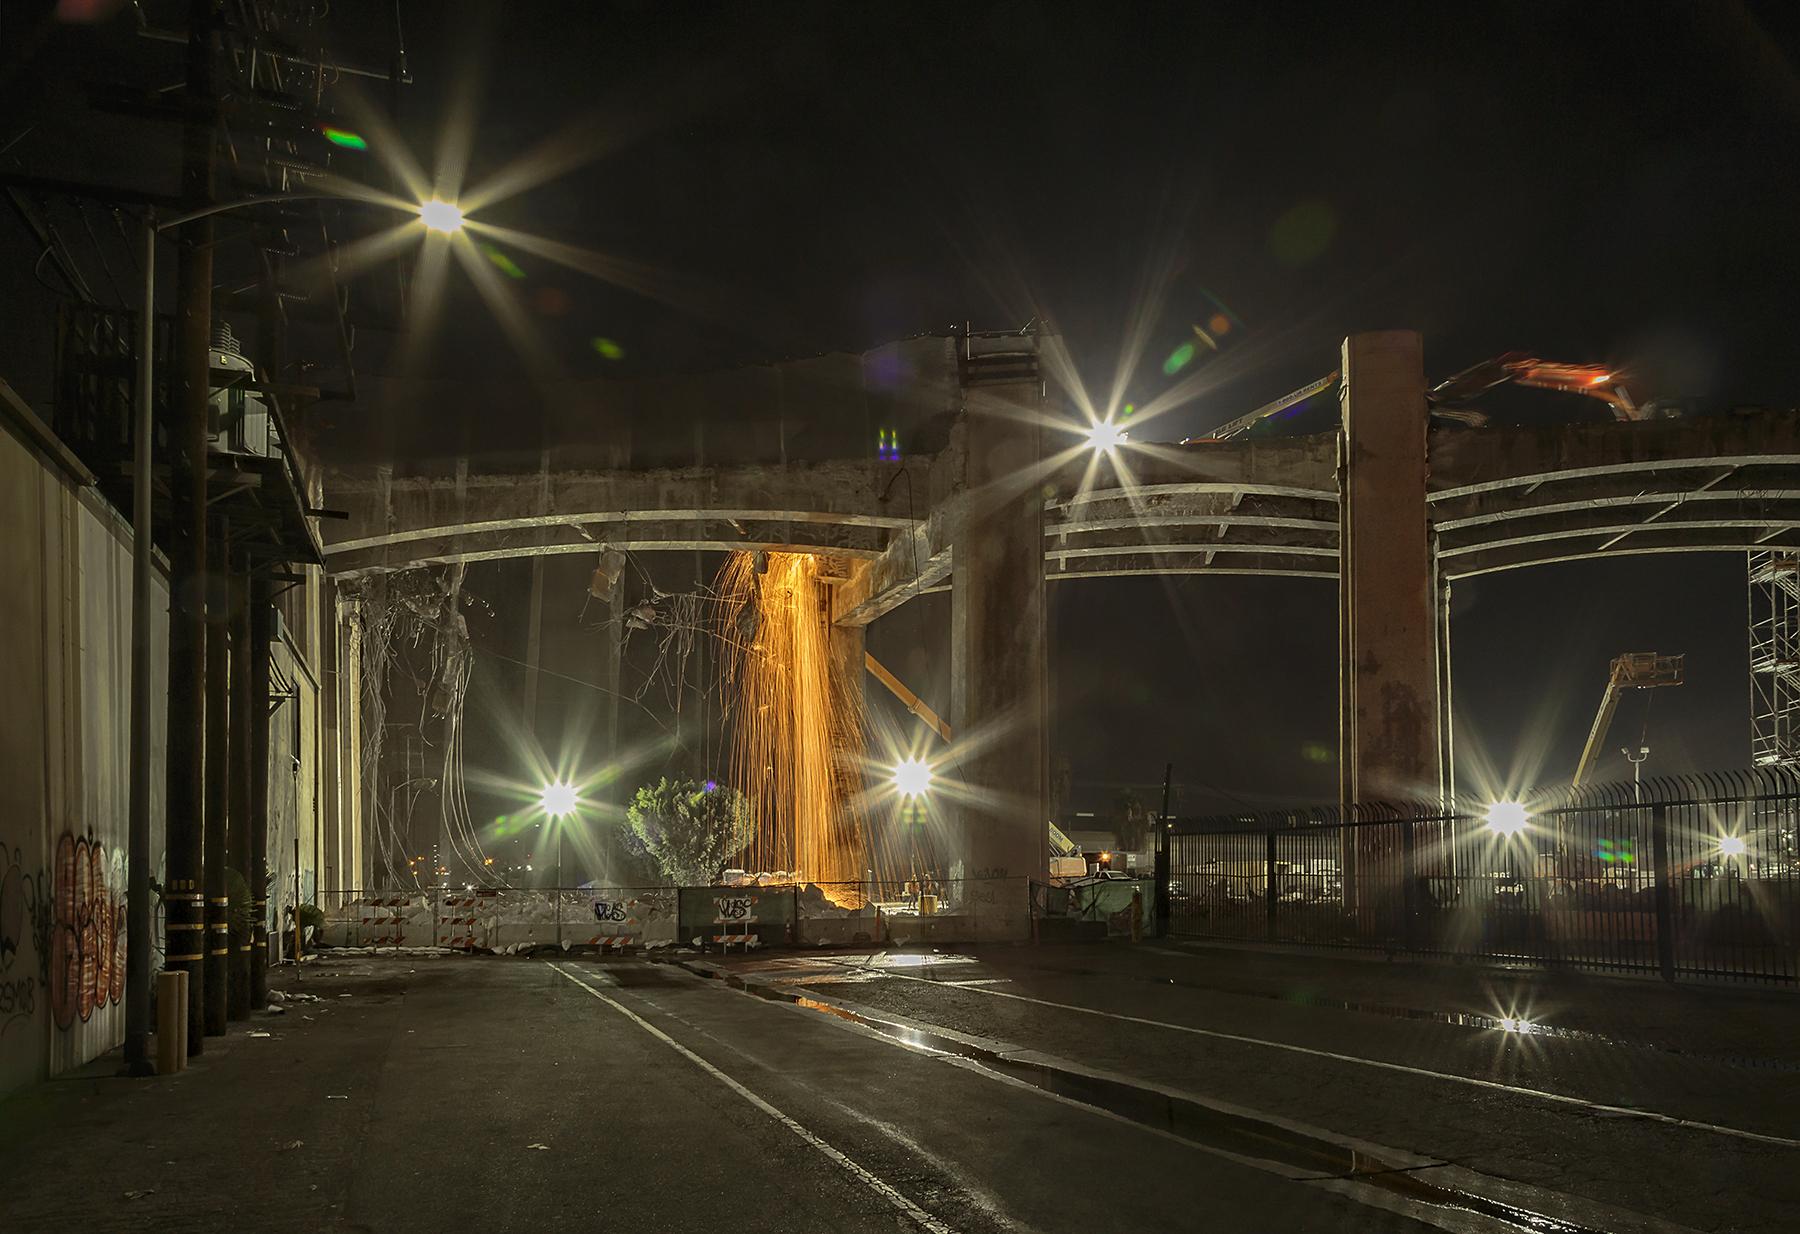 6th street viaduct 2016.06.29.28